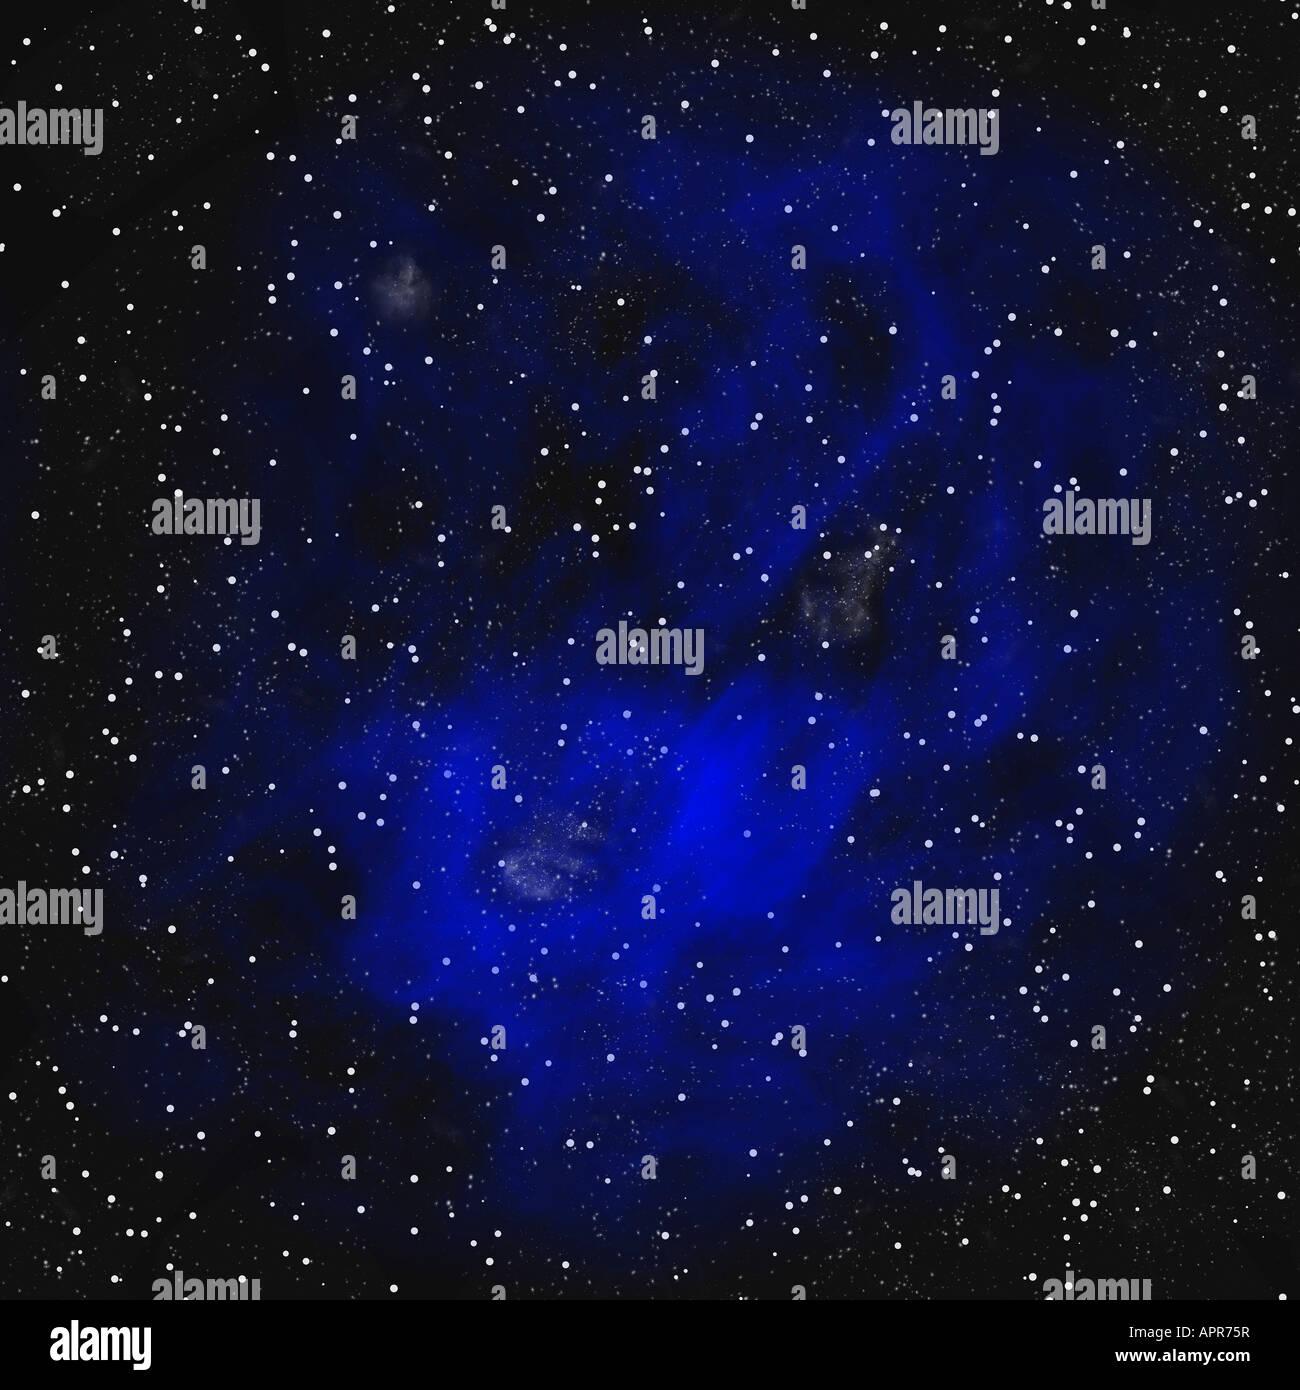 big blue space nebula and stars - Stock Image